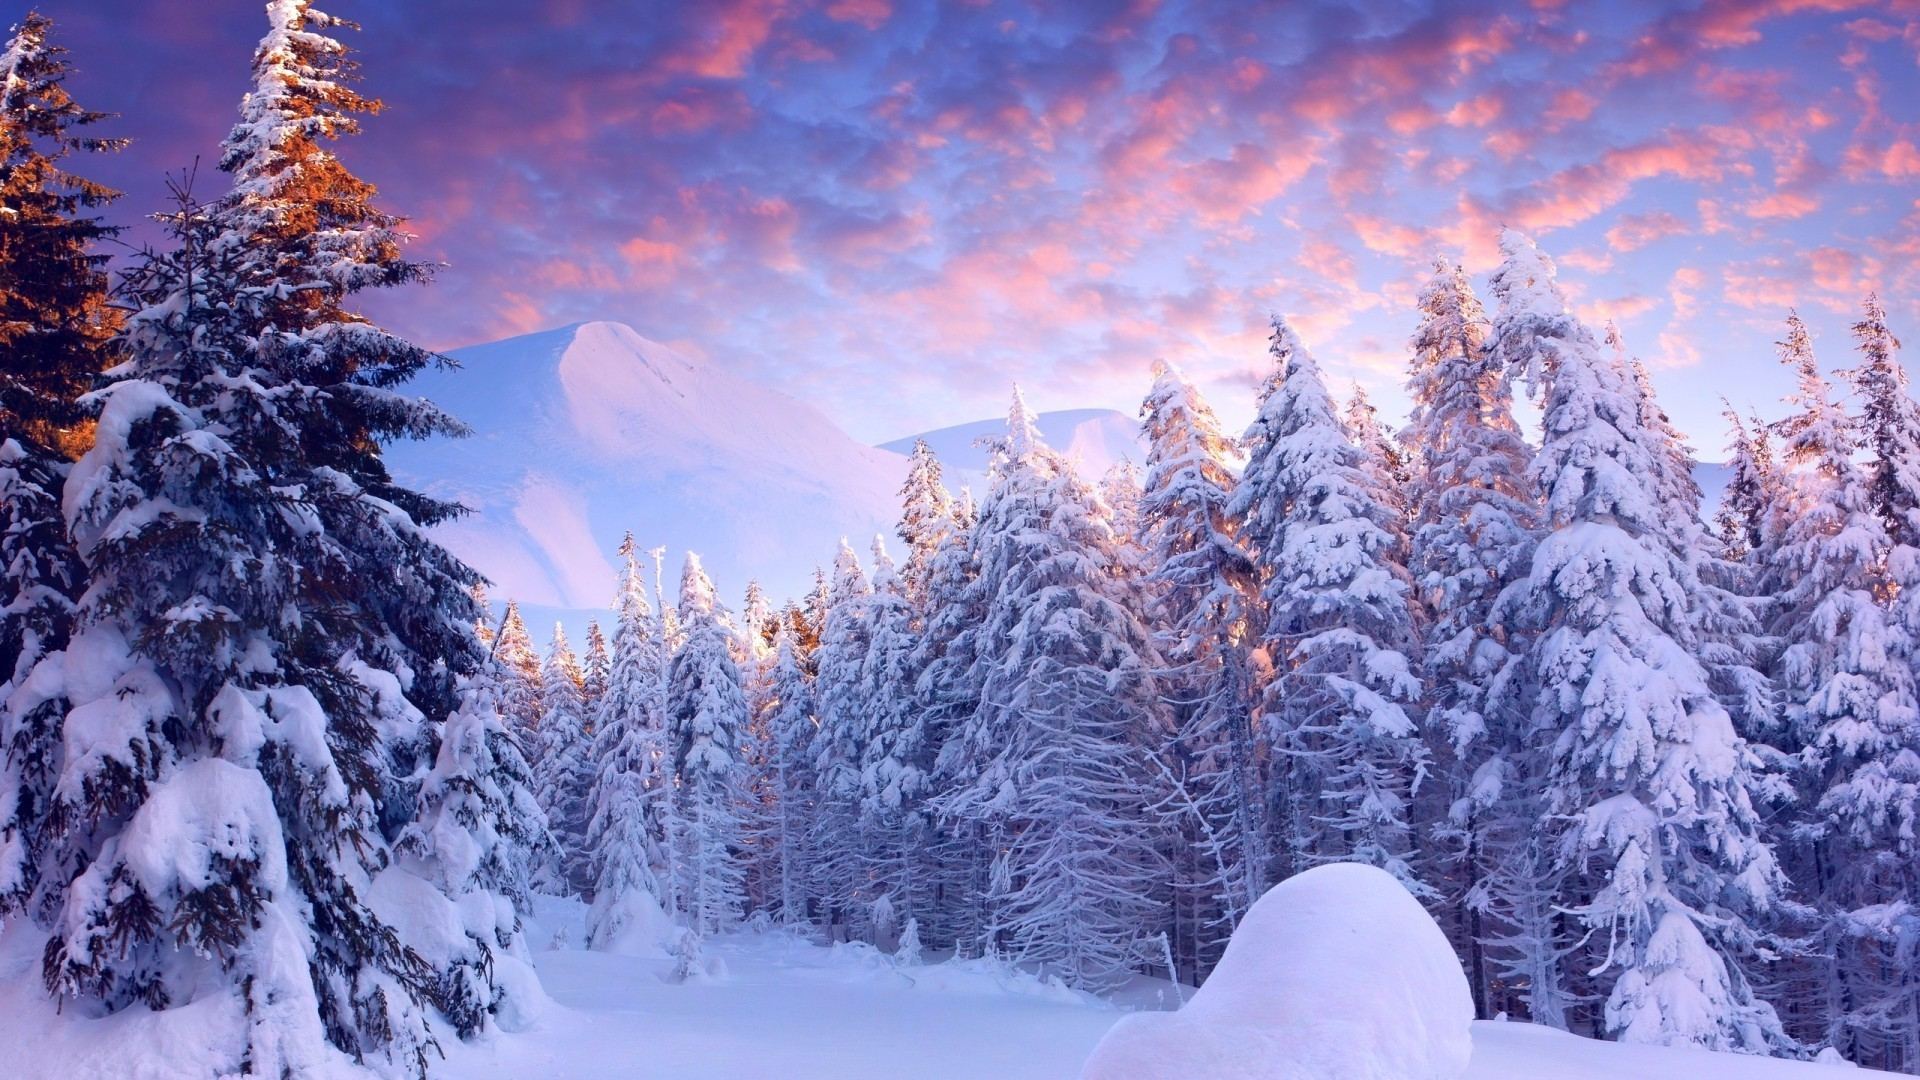 Winter Snow Cold Frost Wood Season Fir Frozen Scenic - Nature Art Landscape Canvas Art Paintings Oil - HD Wallpaper